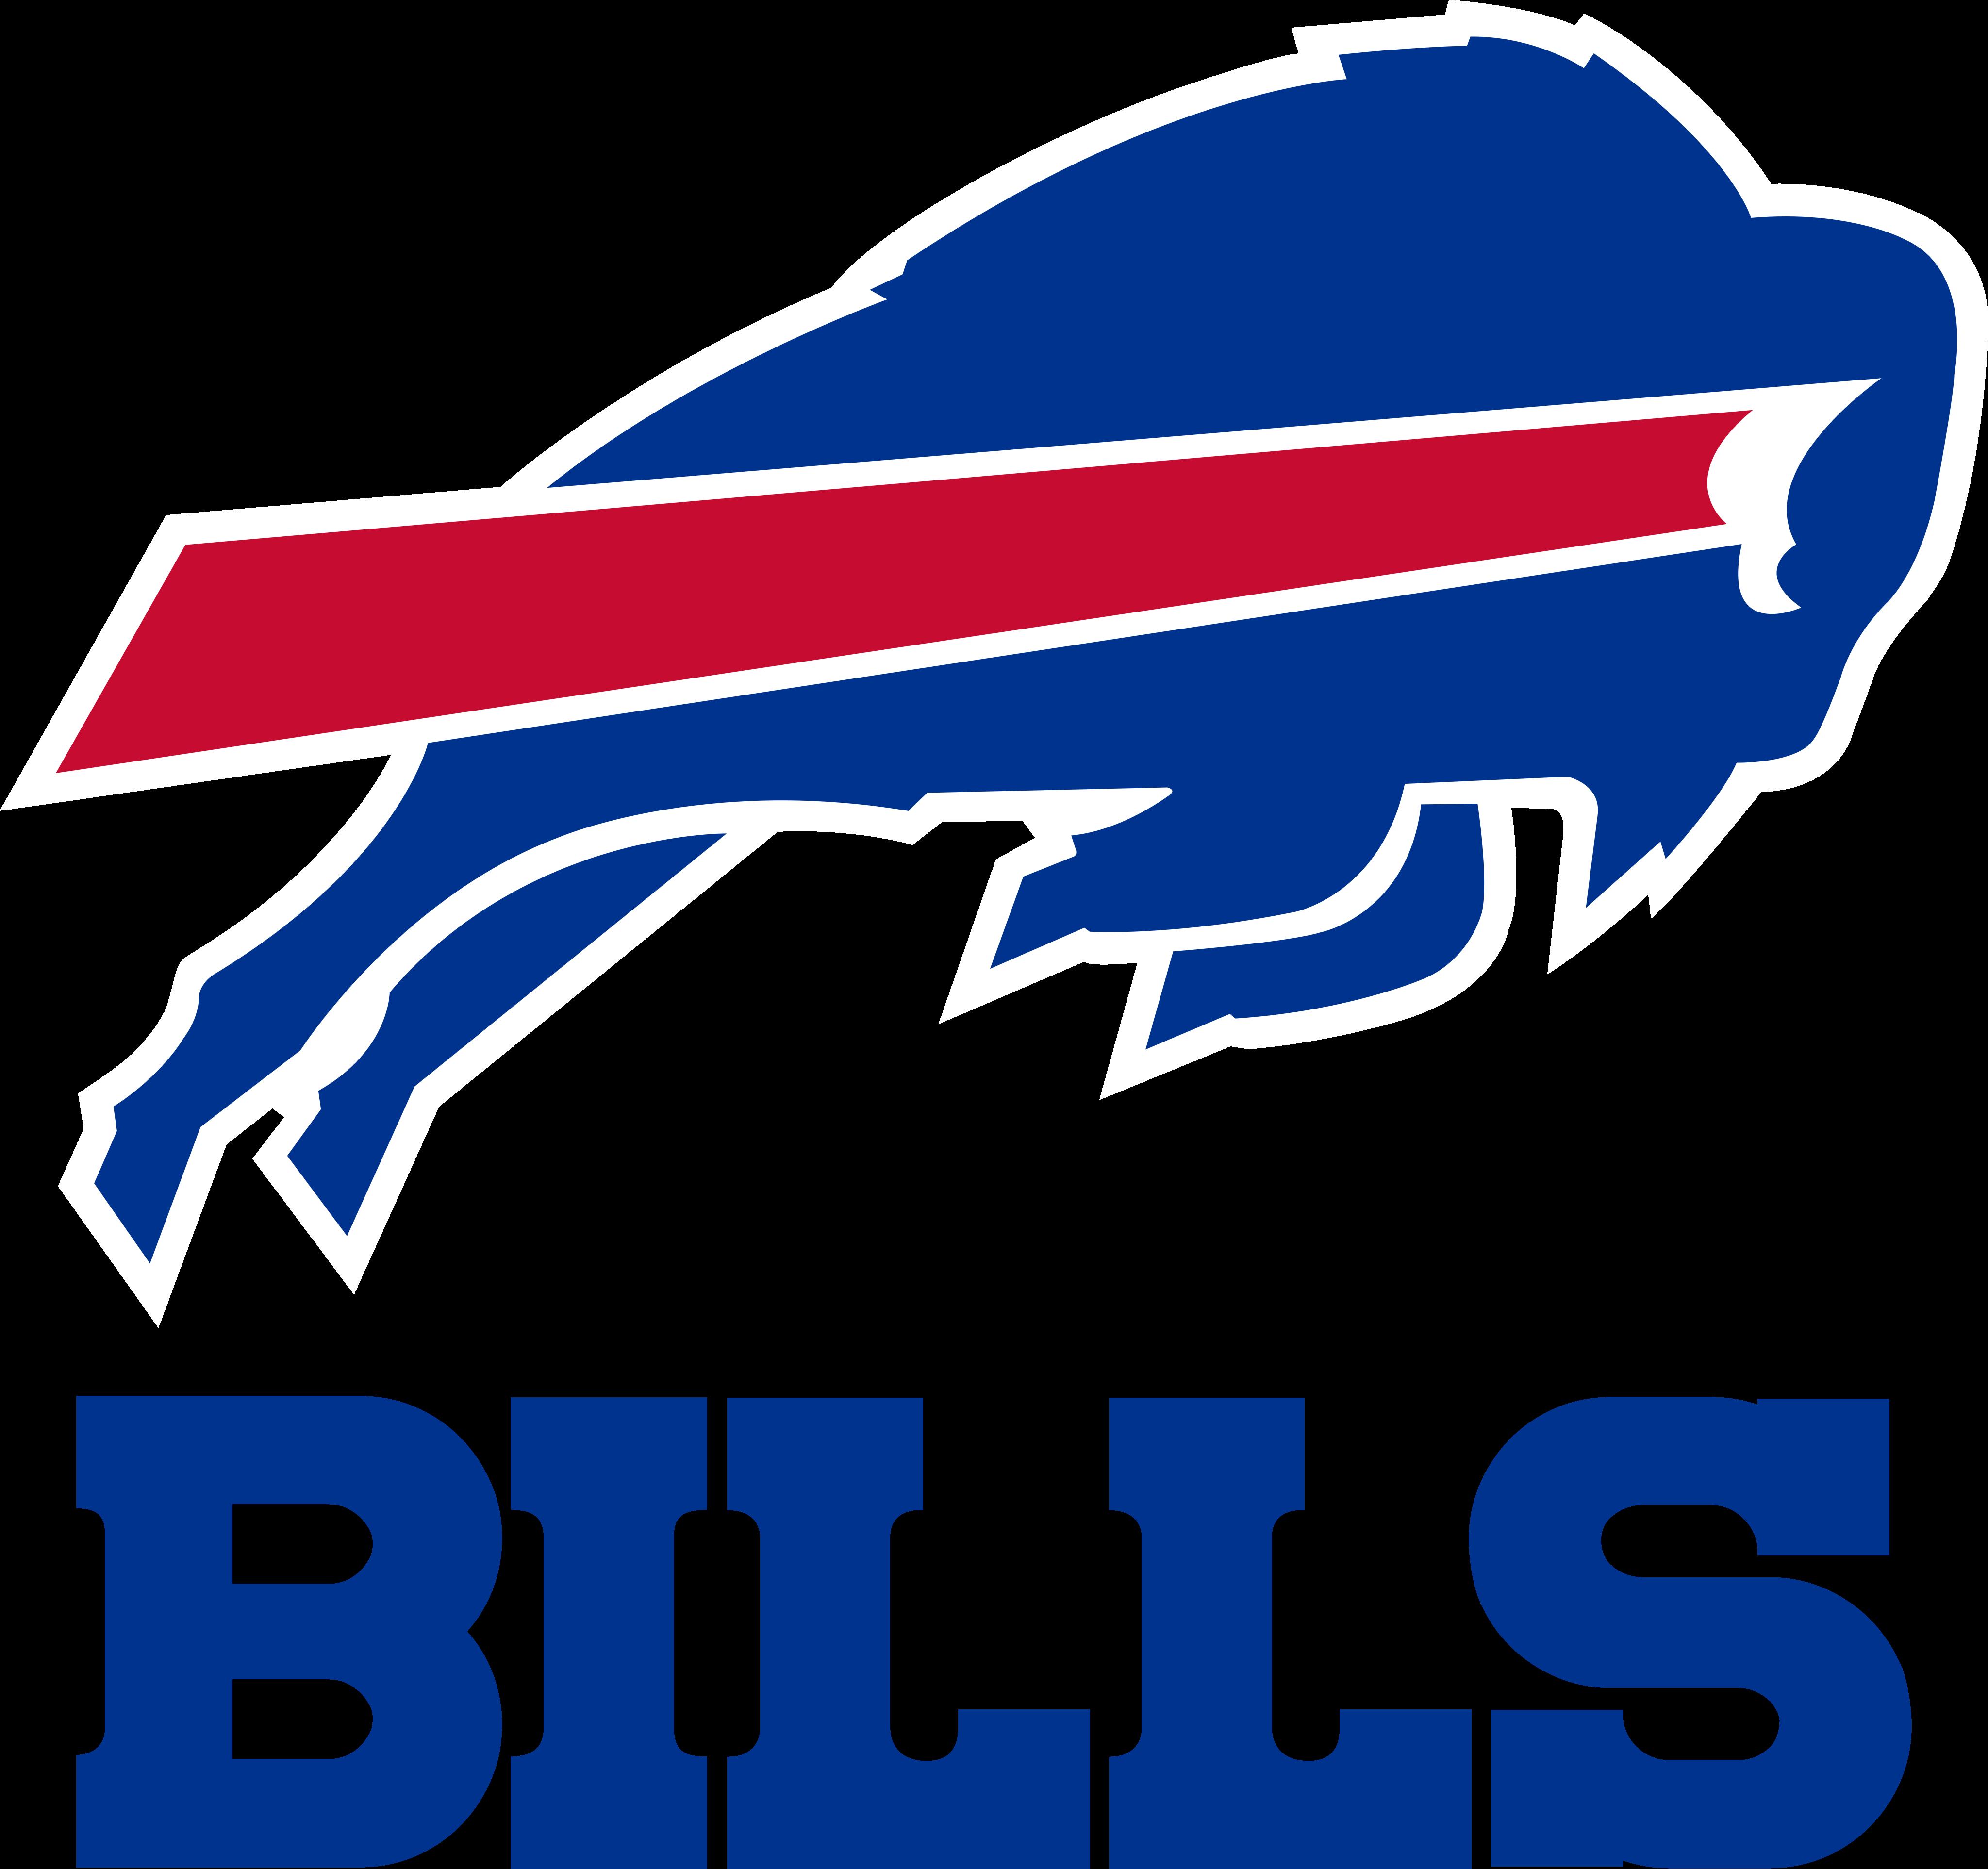 buffalo bills logo 1 - Buffalo Bills Logo